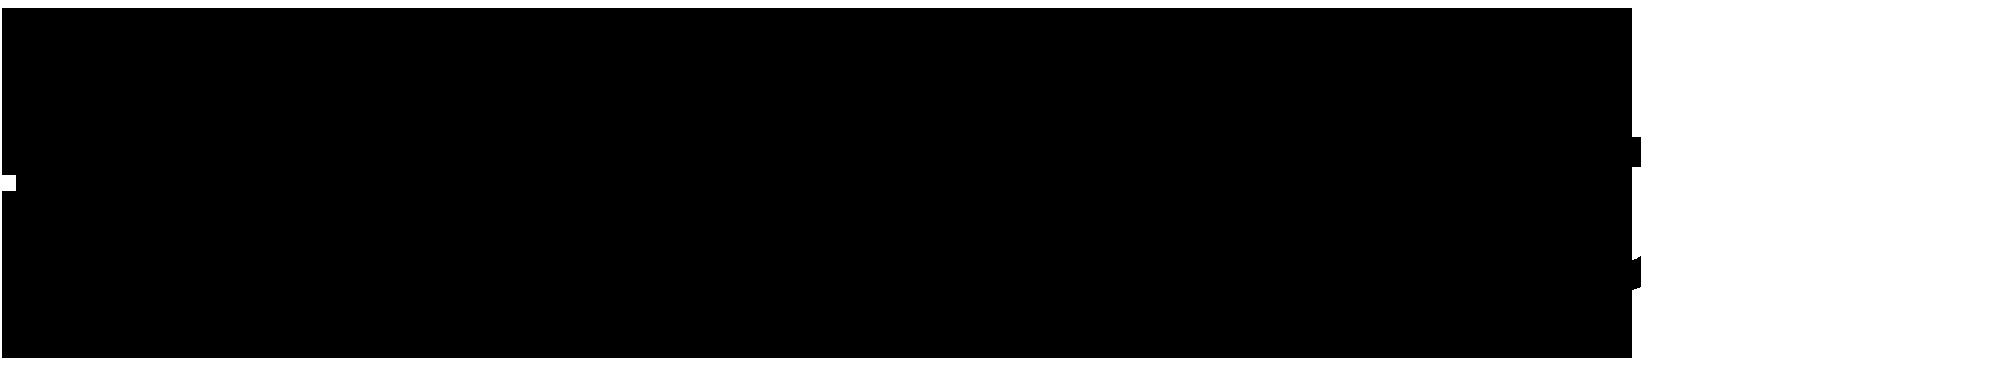 Microsoft_logo_b